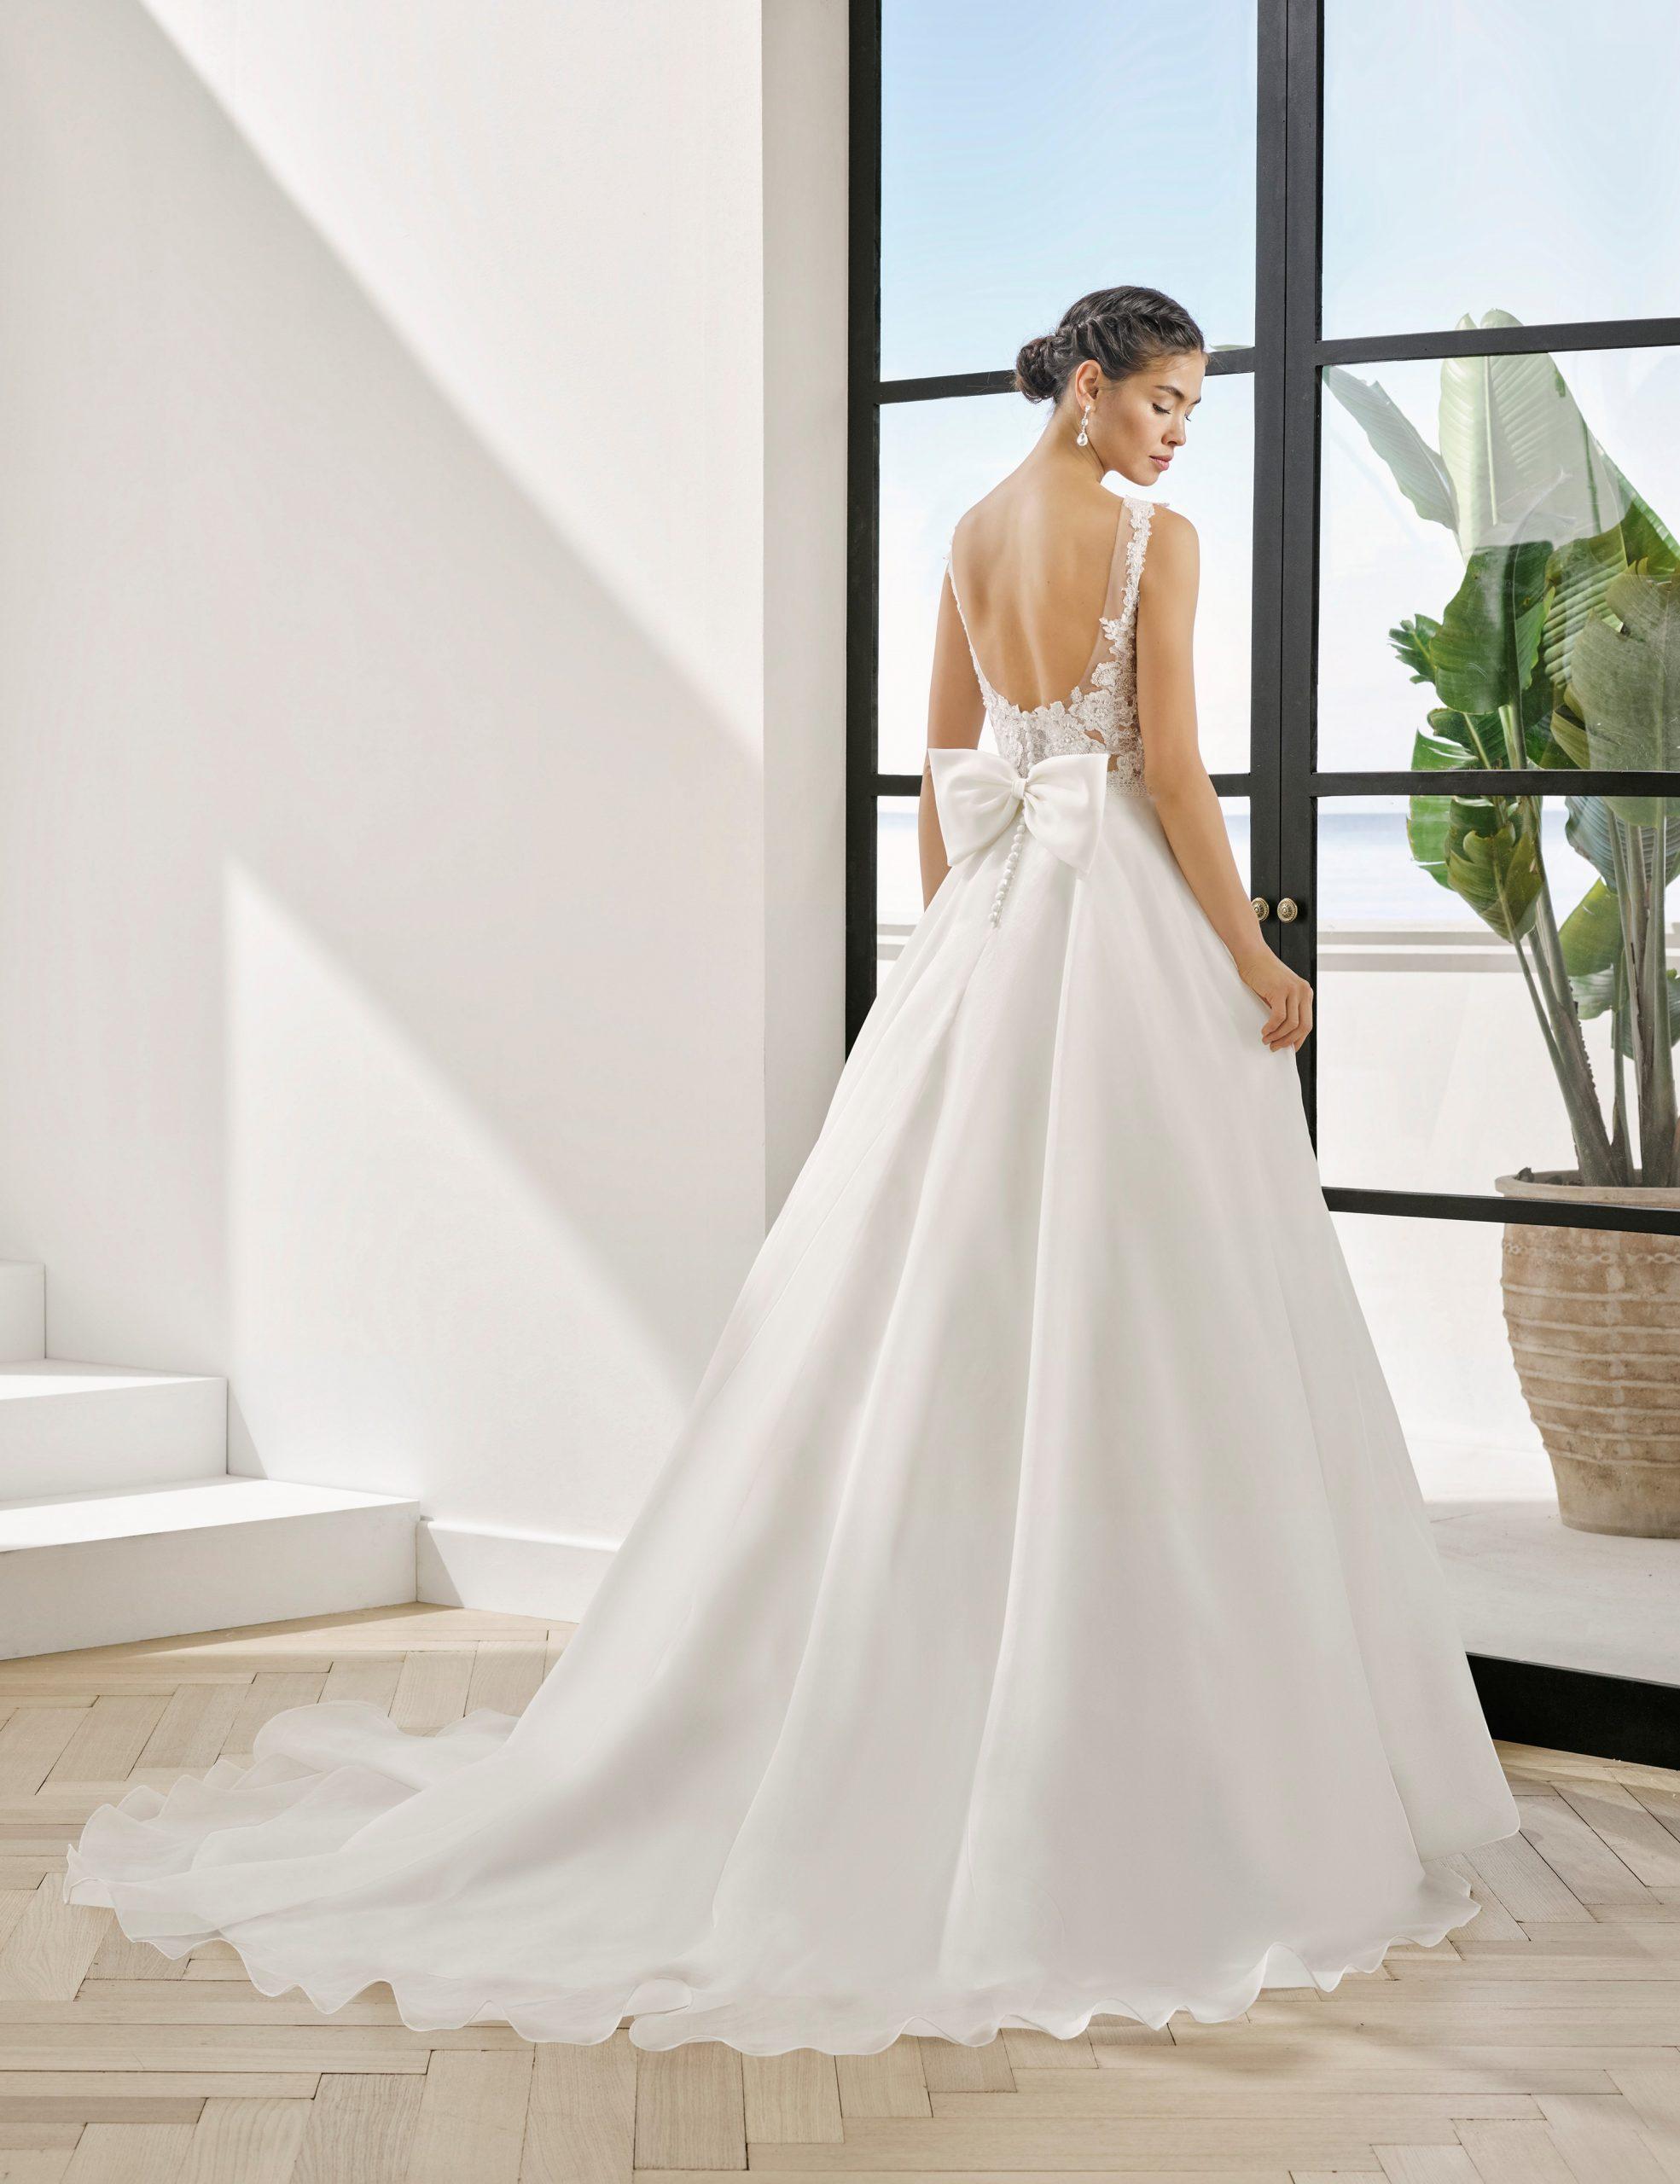 Robes de mariée Portland : 1189€